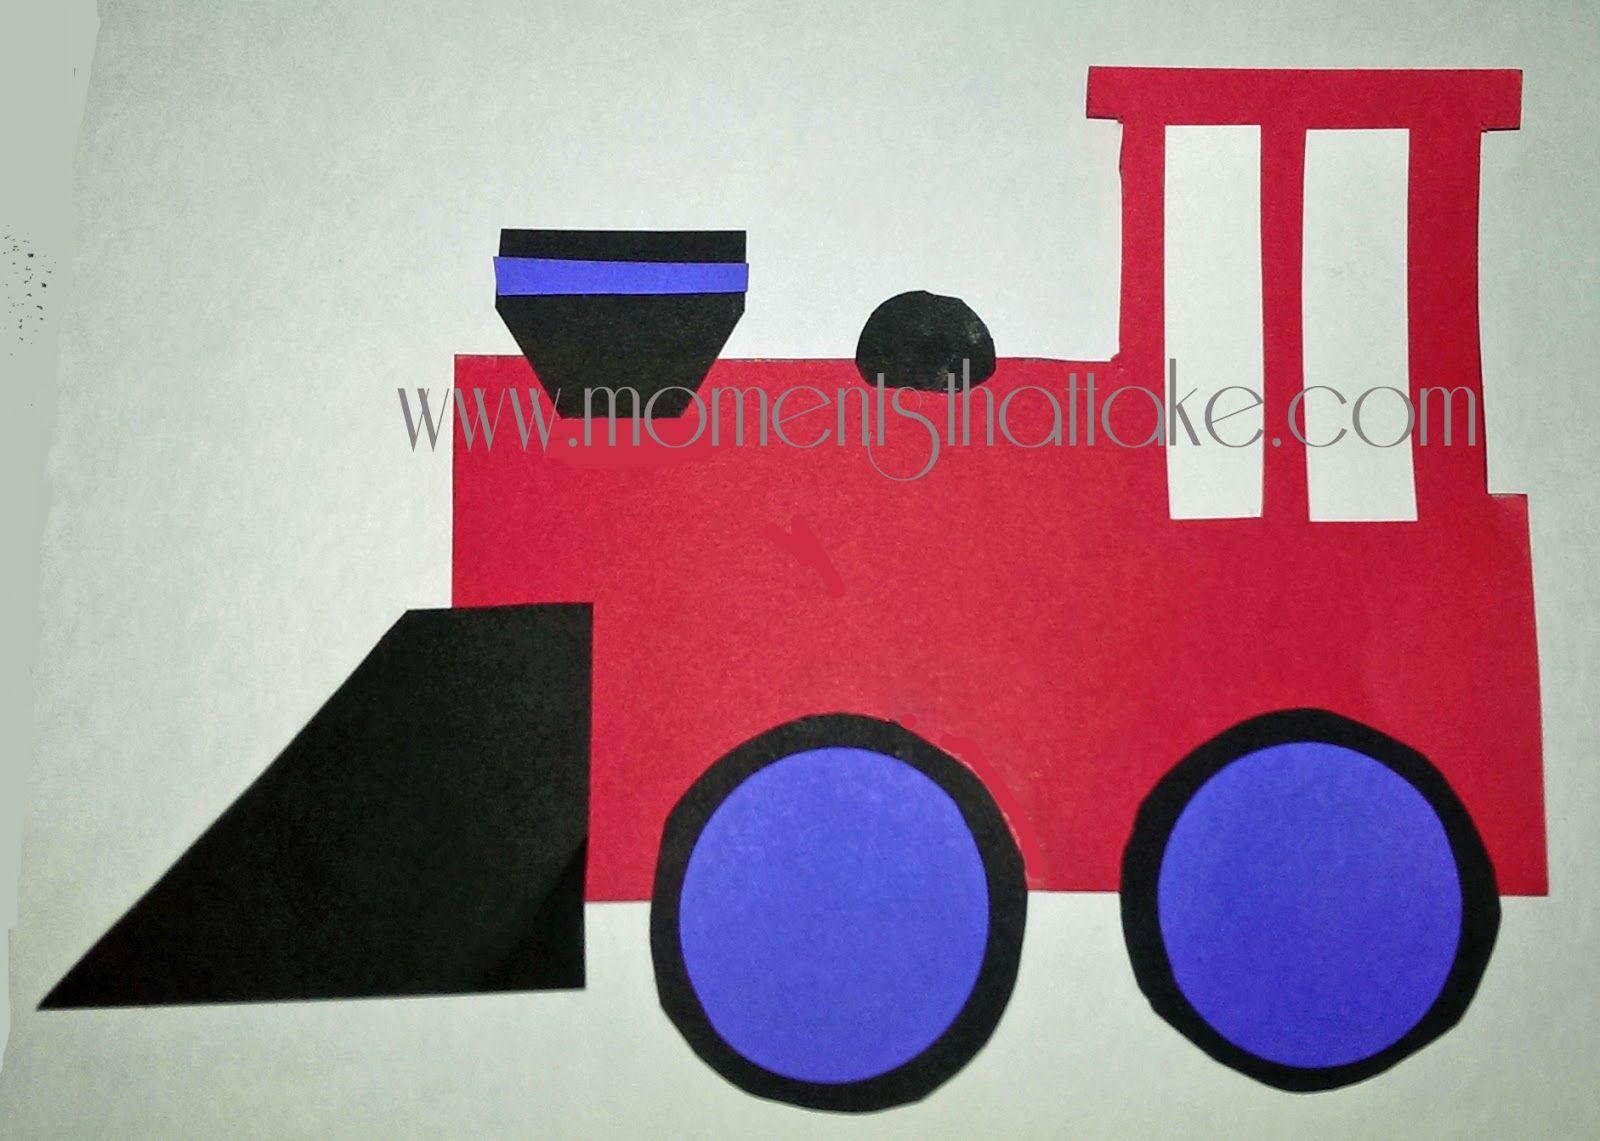 Free Birthday Printables Boy ~ Moments that take my breath away: diy train birthday banner free